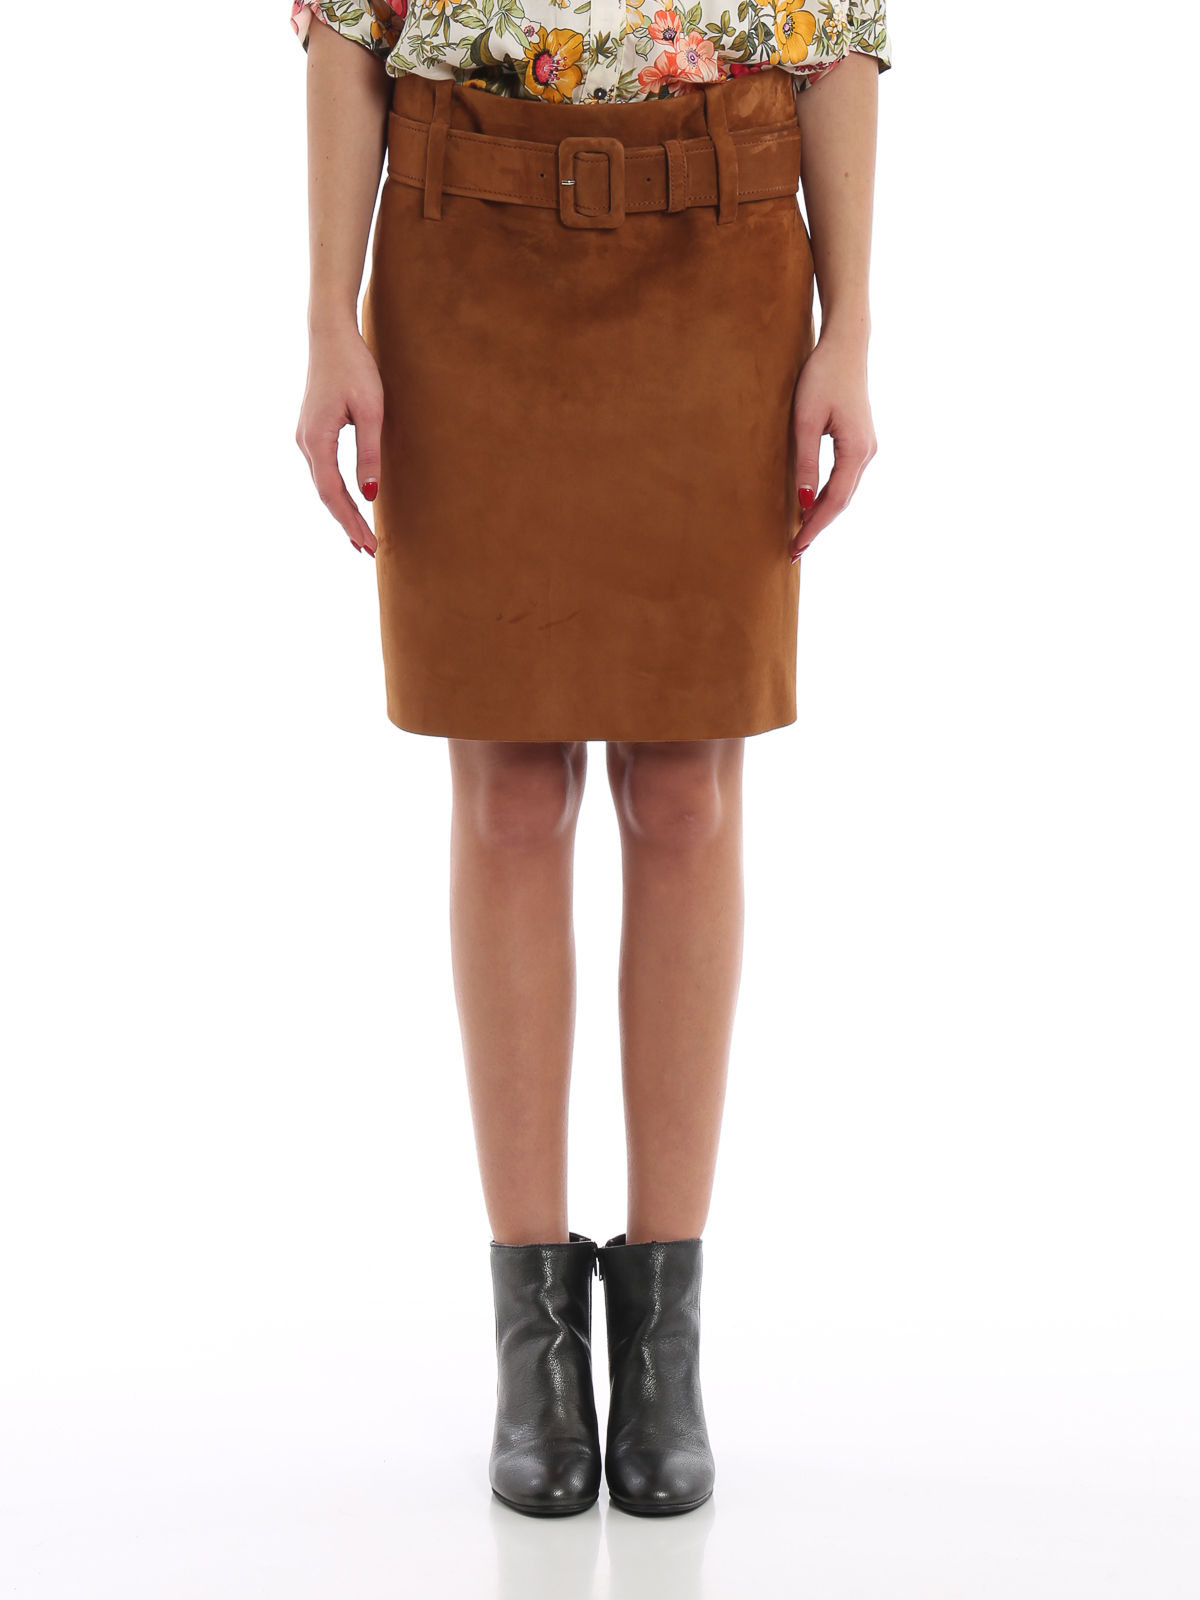 9b69a43d0b Prada - Soft suede pencil mini skirt - leather skirts - 51726 1FEK 050